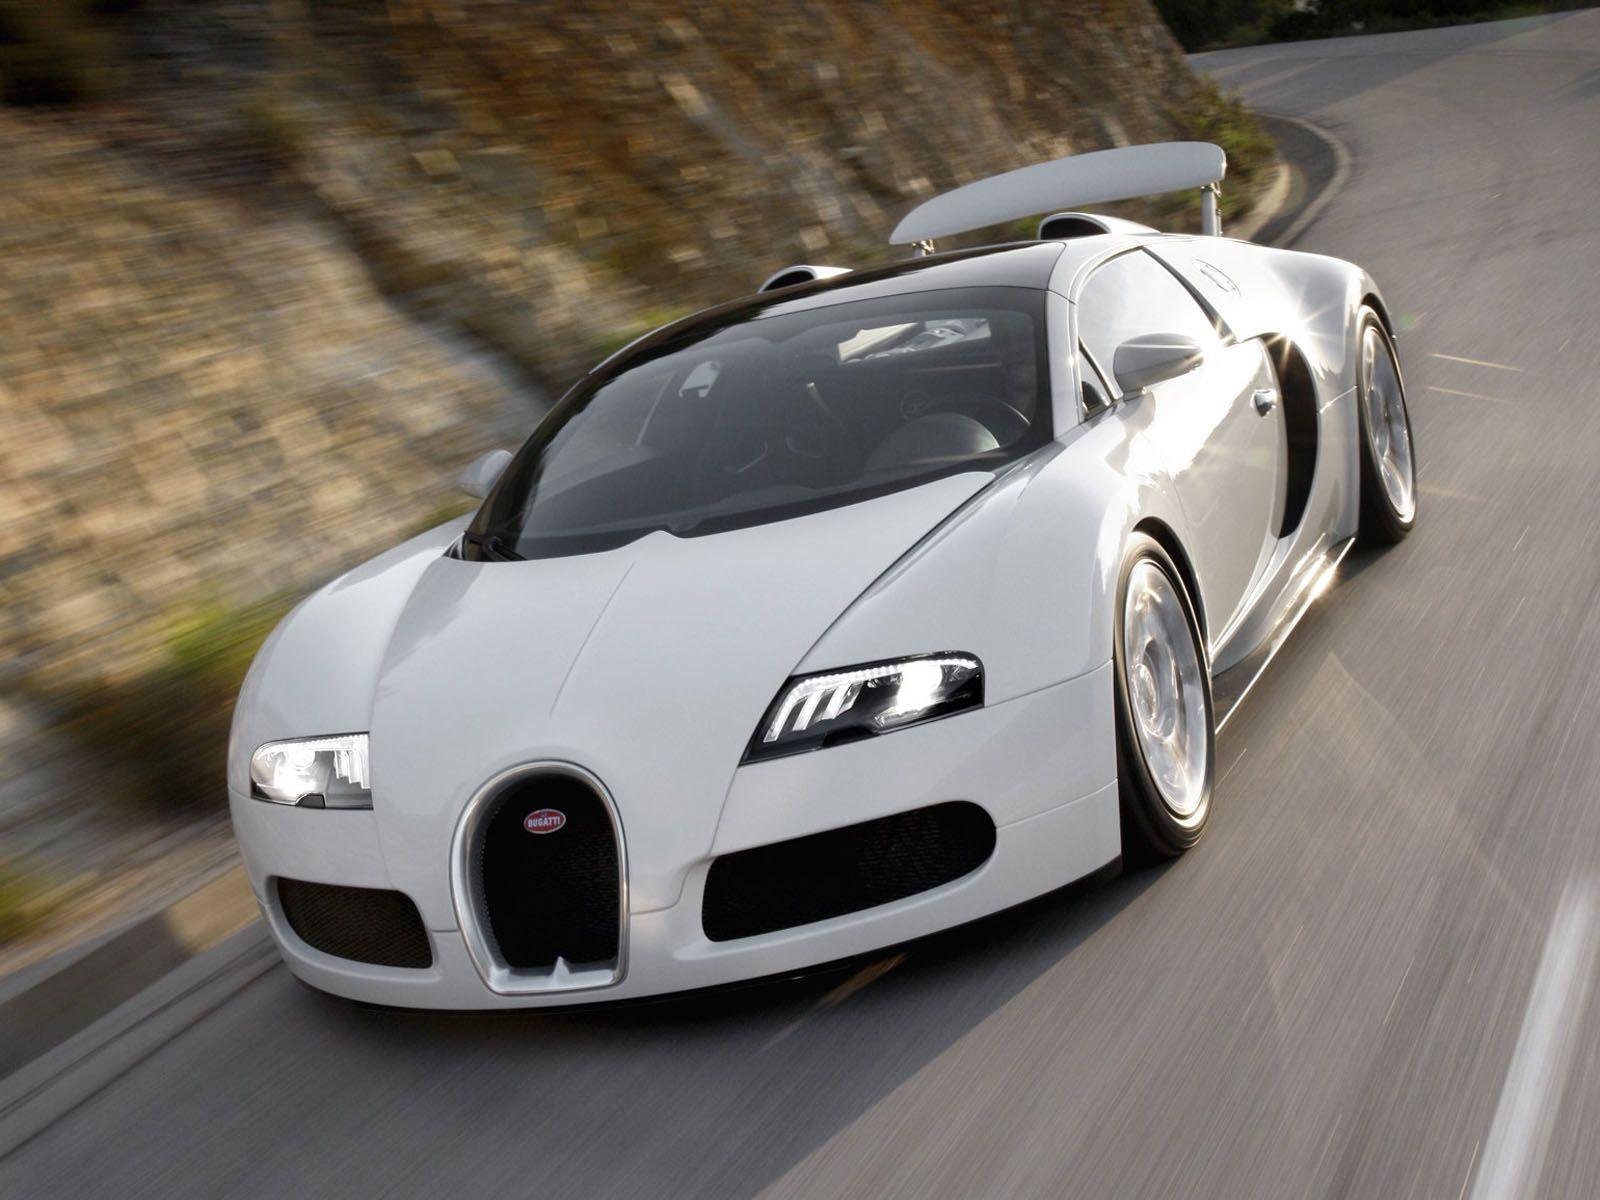 Bugatti Veyron Grand Sport Wallpaper Http Wallpaperzoo Com Bugatti Veyron Grand Sport Wallpaper 27226 Htm Bugatti Veyron Bugatti Coloriage Voiture De Sport